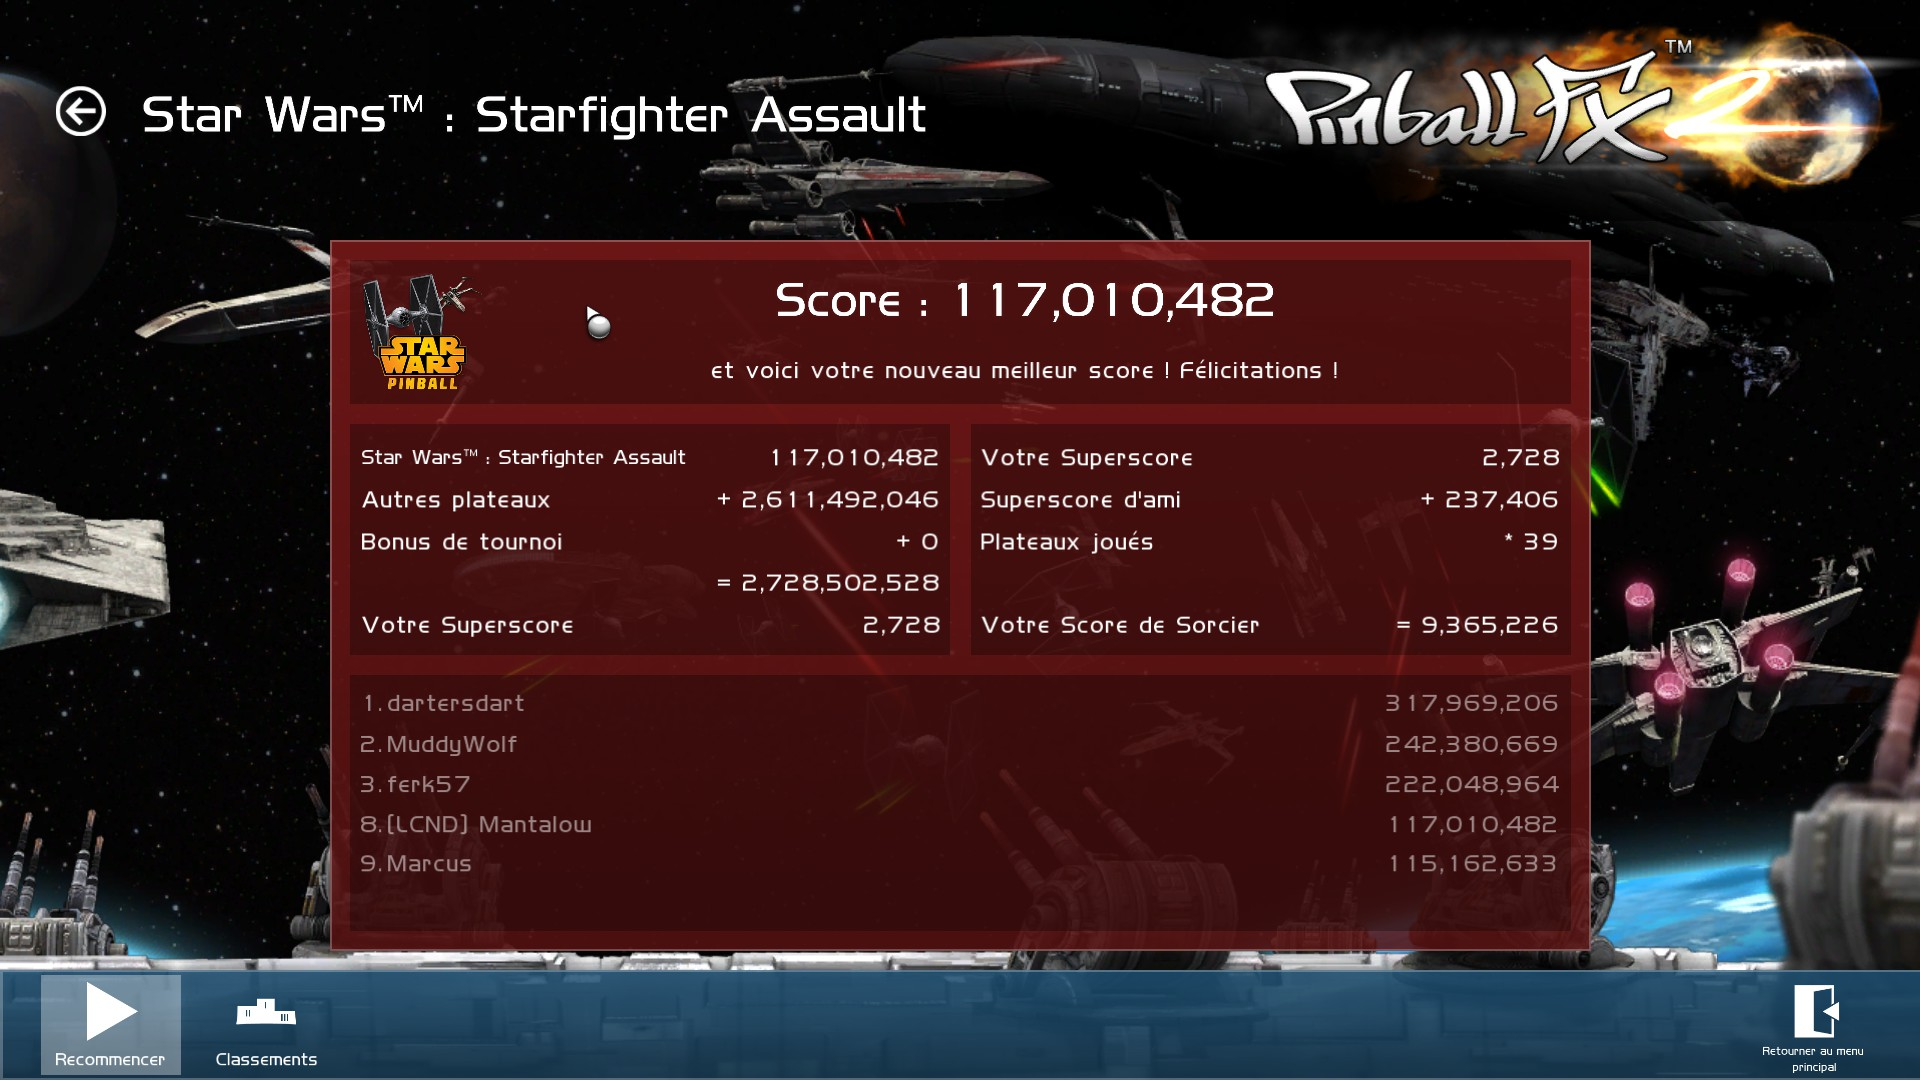 Mantalow: Pinball FX 2: Star Wars: Starfighter Assault (PC) 117,010,482 points on 2015-03-05 10:06:14